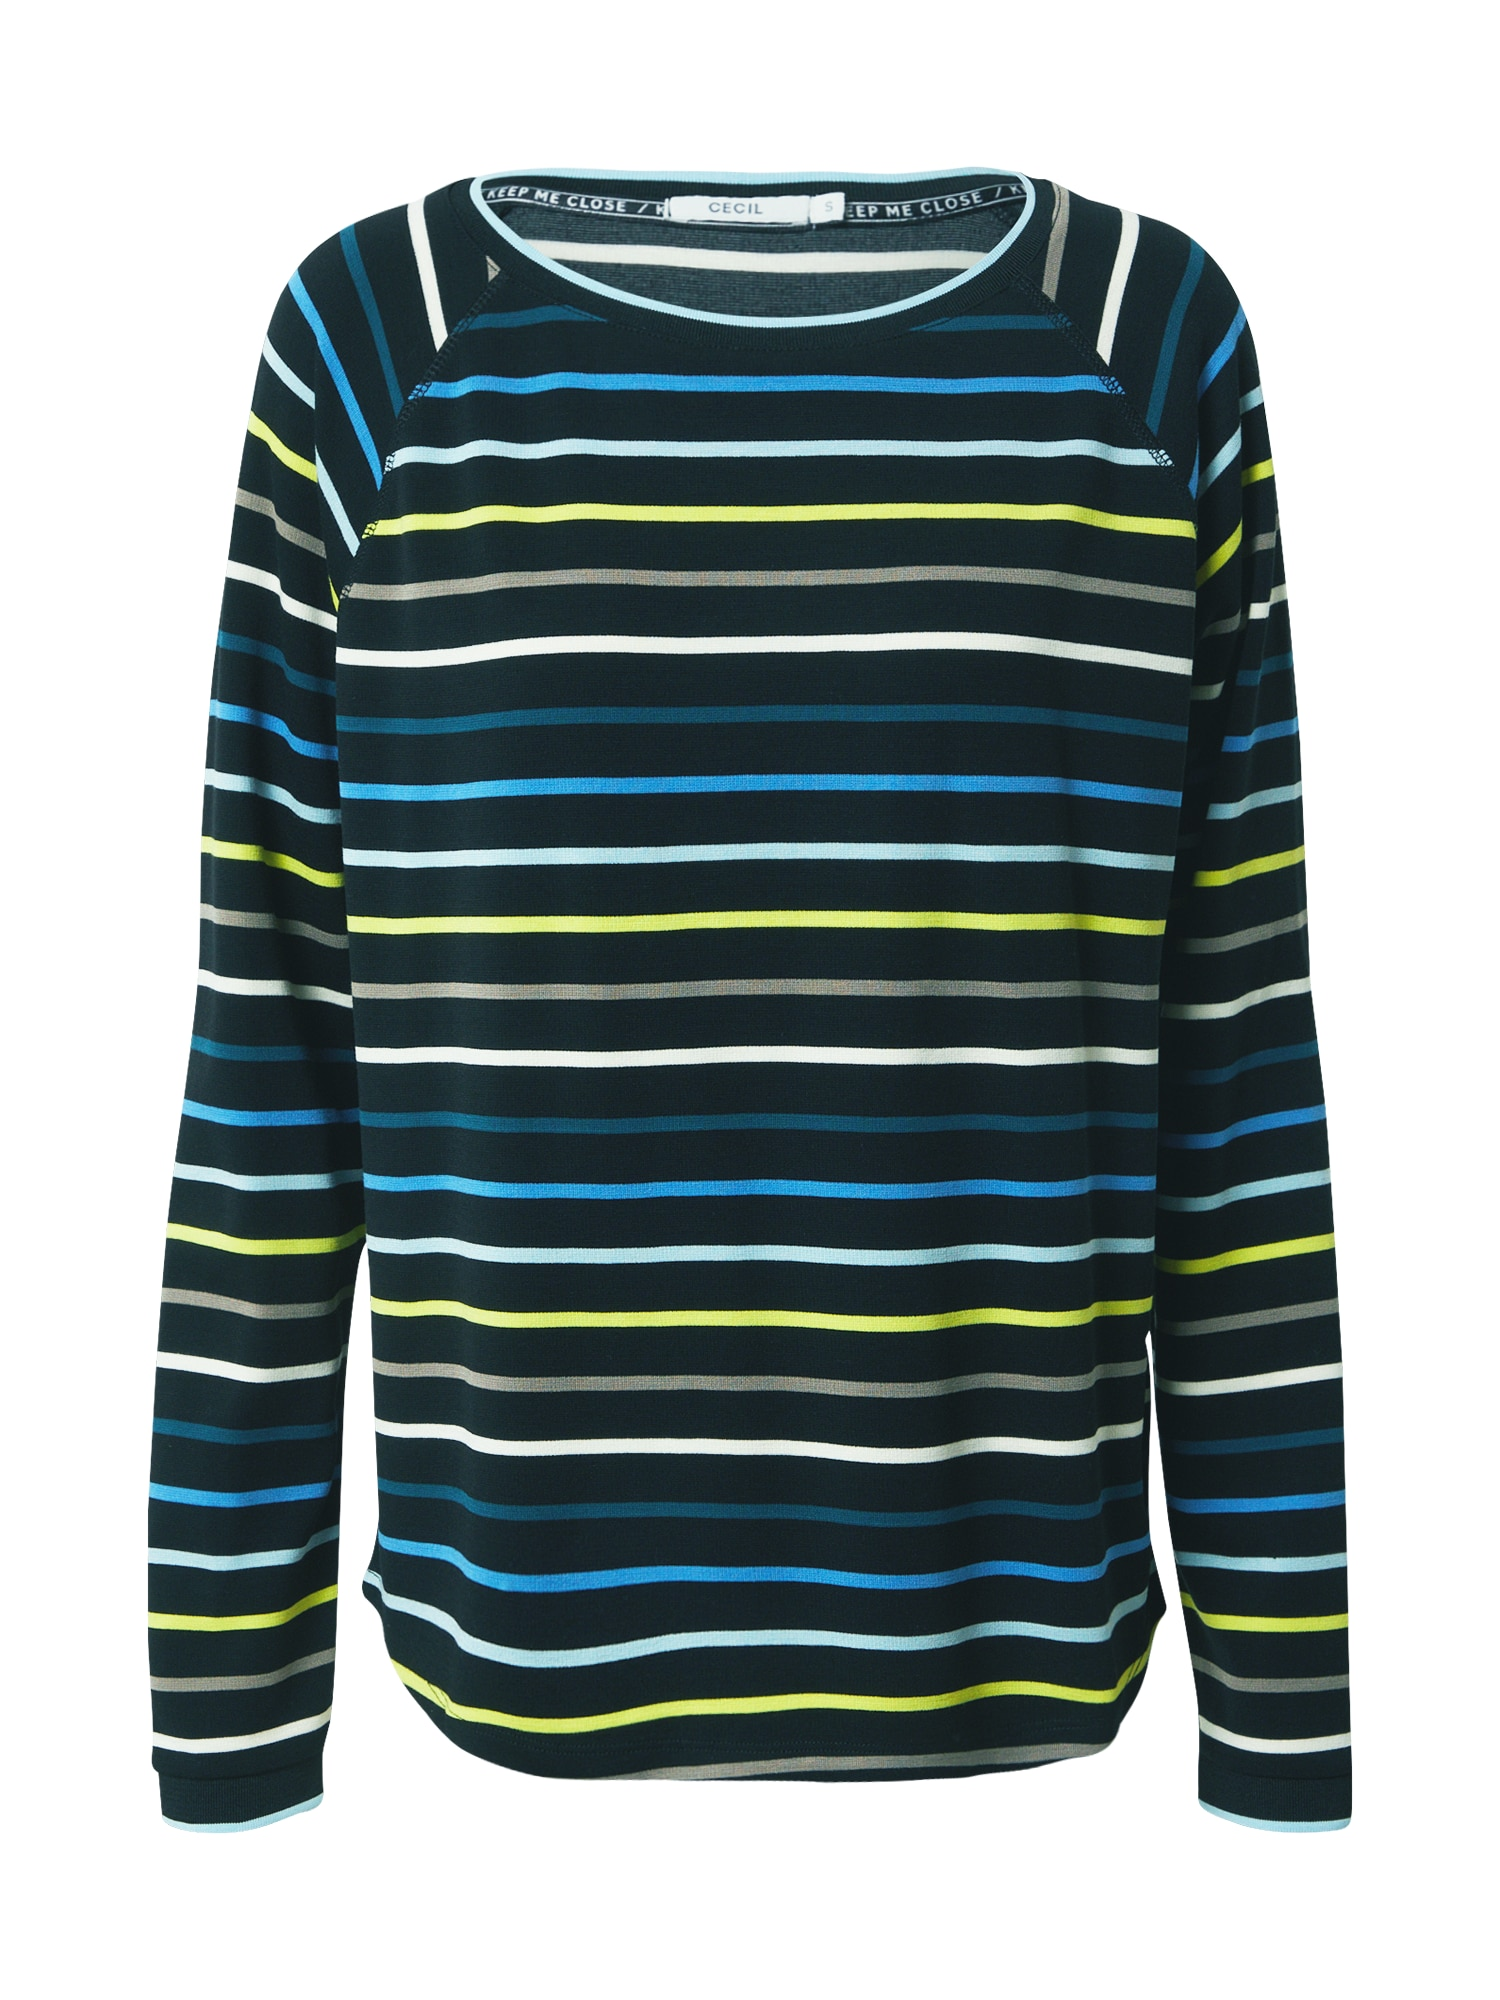 CECIL Marškinėliai juoda / mėlyna / geltona / balta